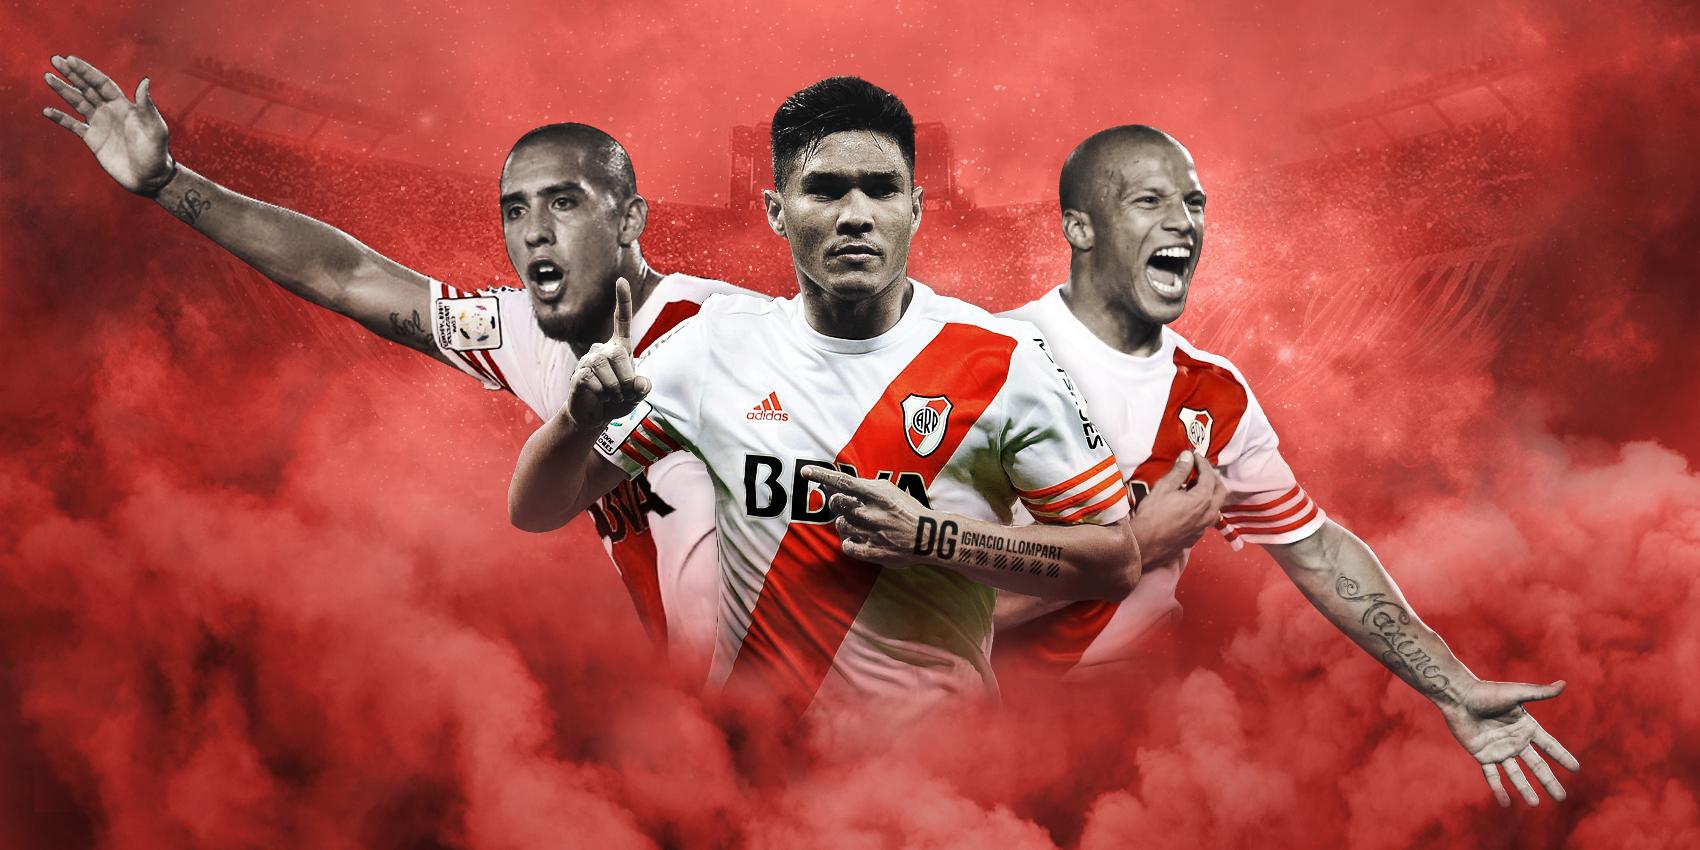 River Plate Hd Wallpapers 85089 Loadtve